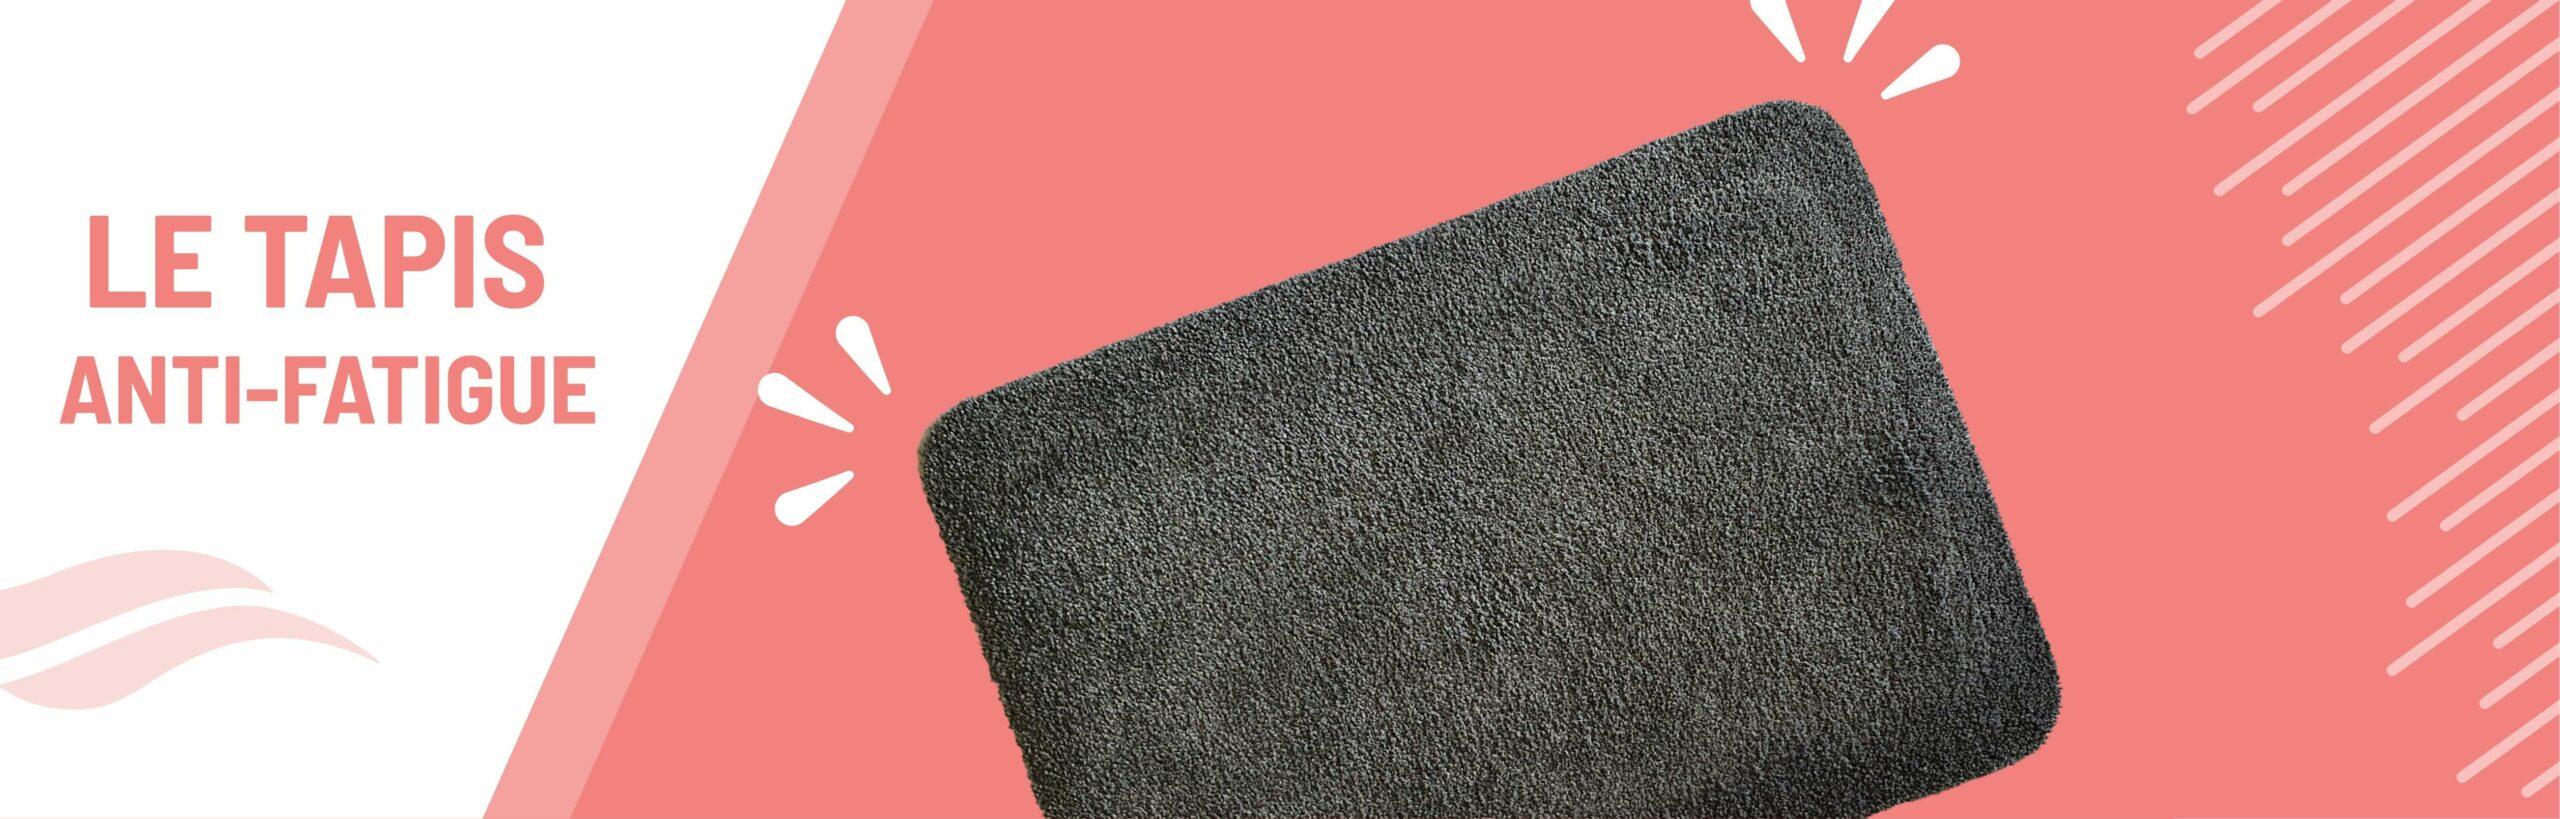 tapis anti fatigue